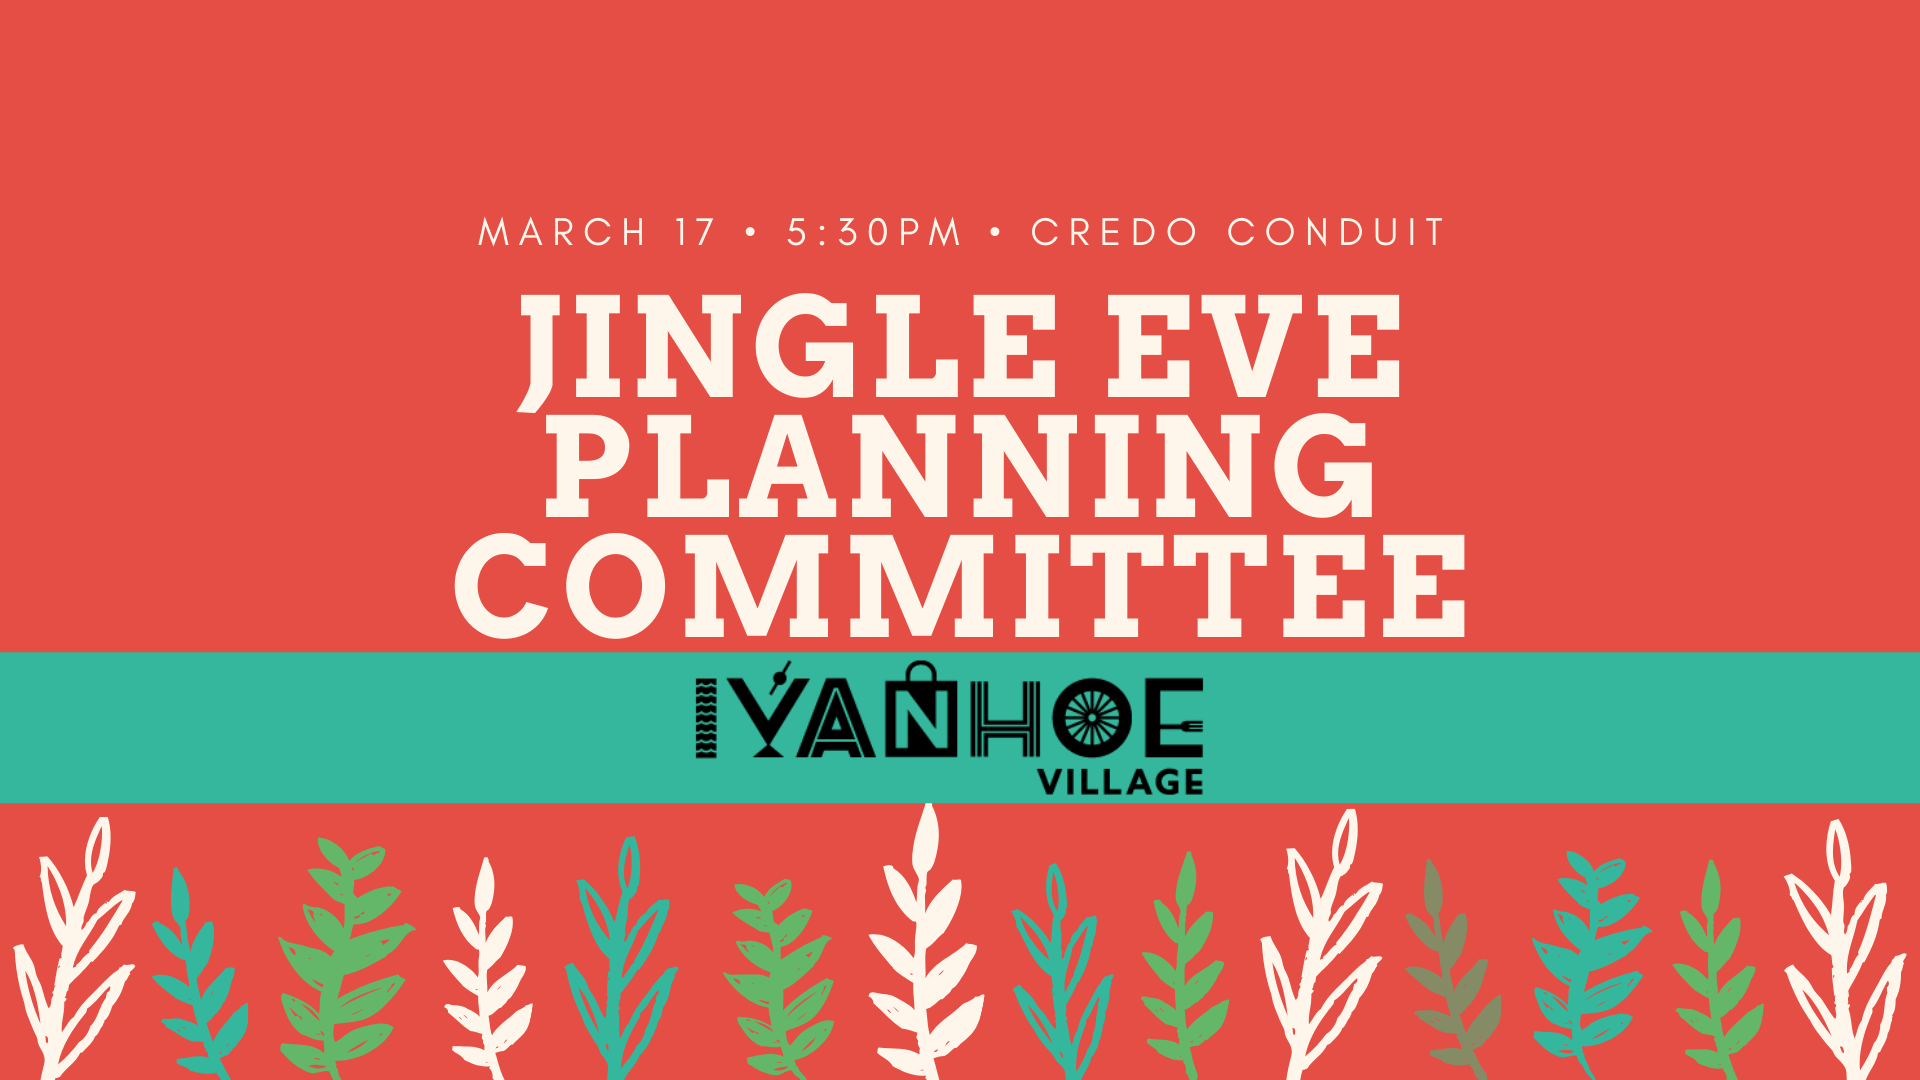 Jingle Eve Planning Committee